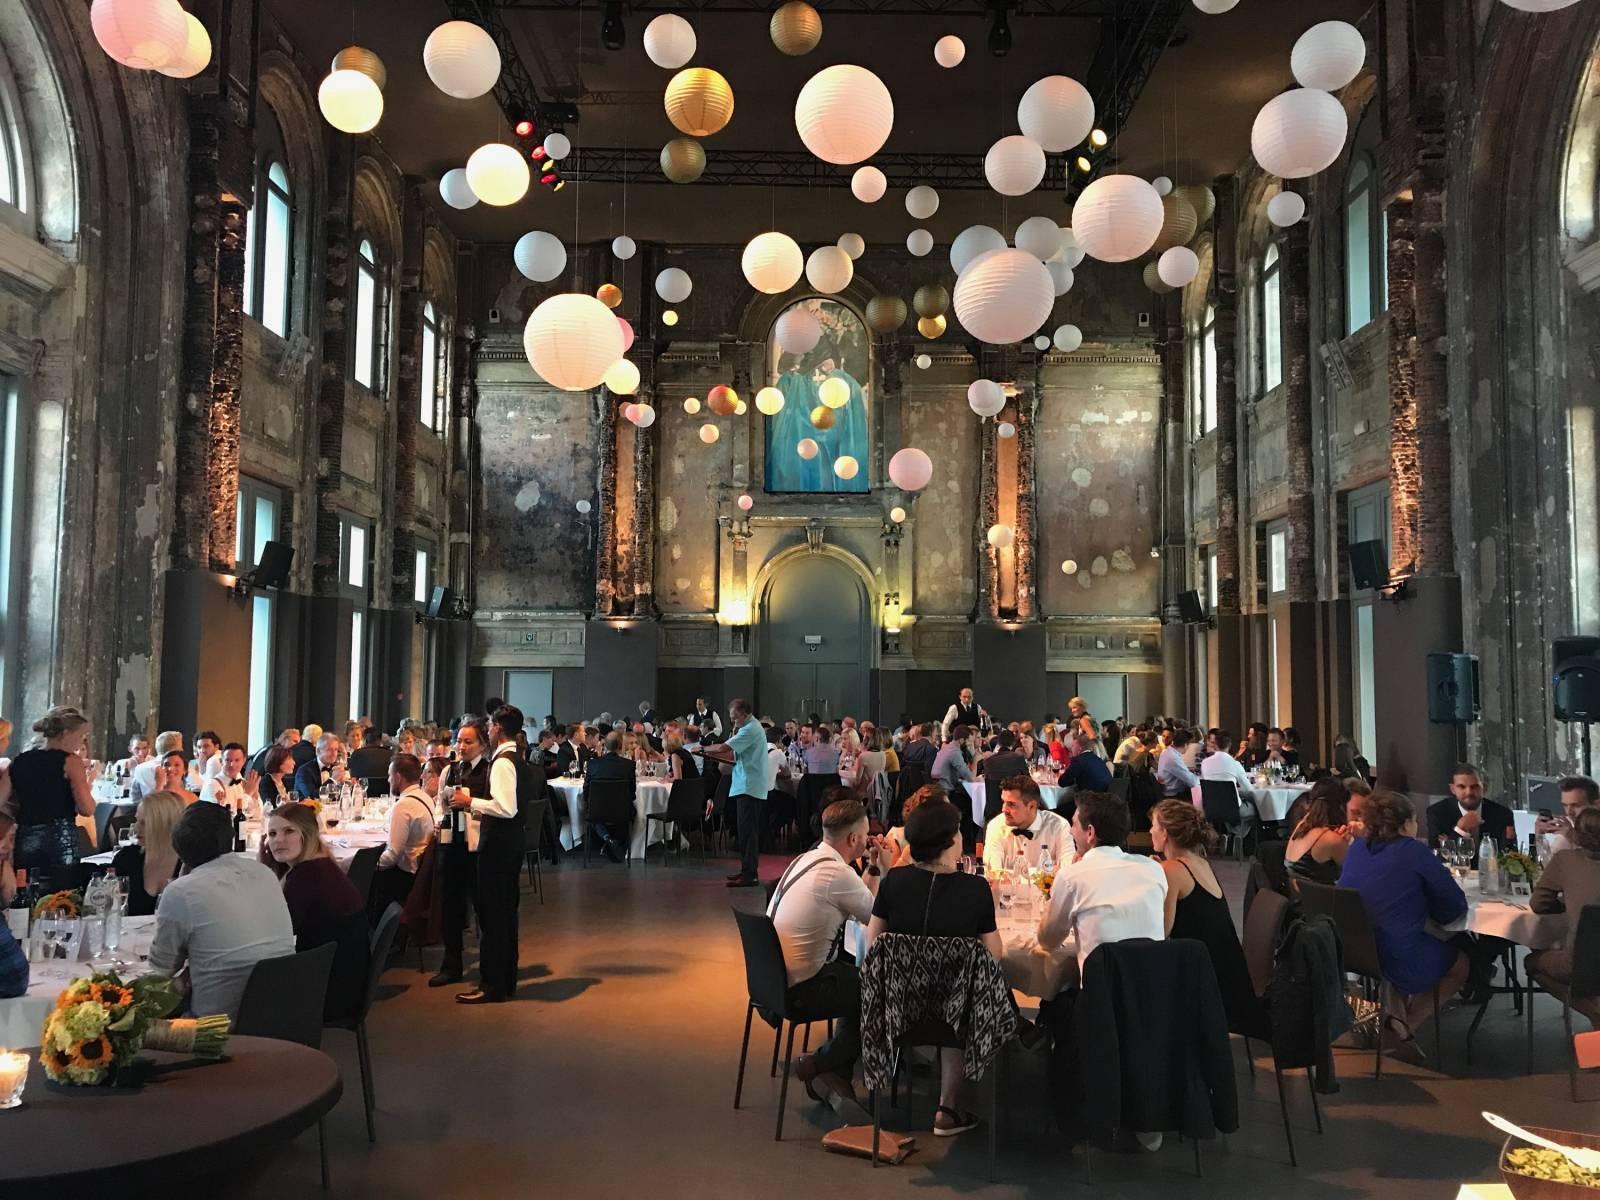 Zaal AthenA - Feestzaal - Trouwzaal - Antwerpen - House of Weddings - 27